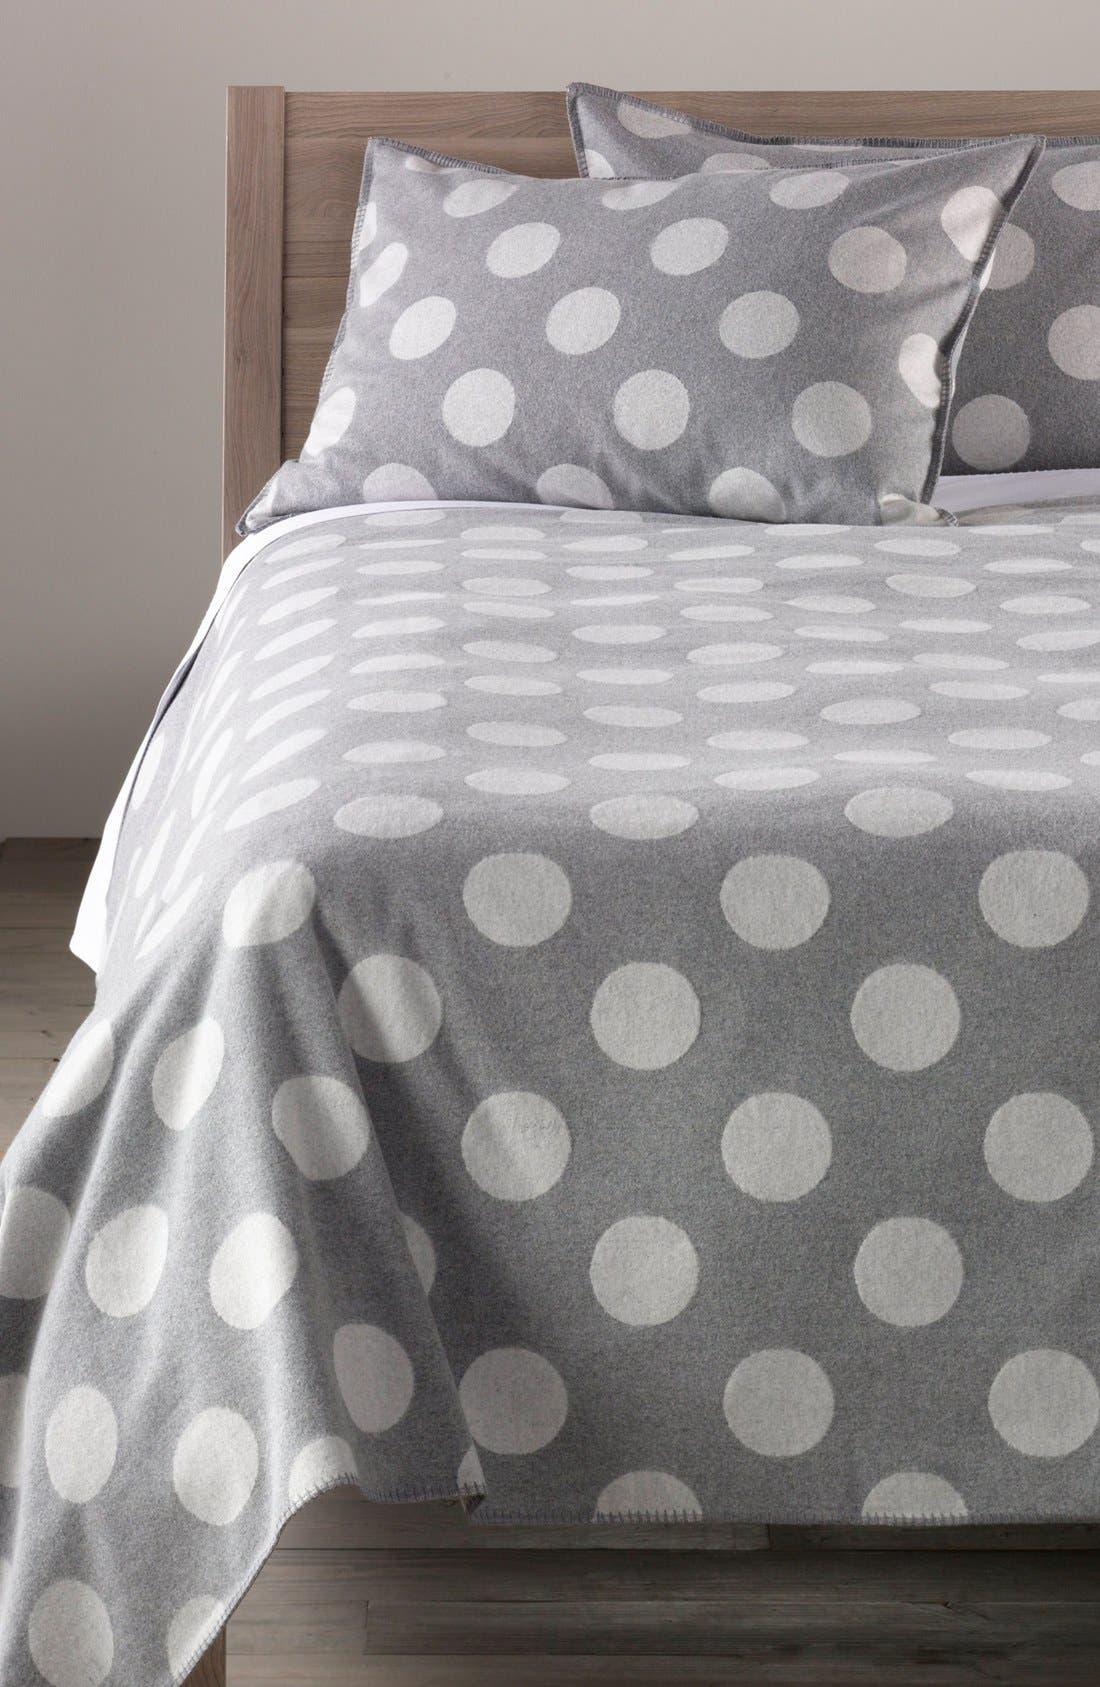 Alternate Image 1 Selected - Nordstrom at Home 'Dottie' Flannel Blanket